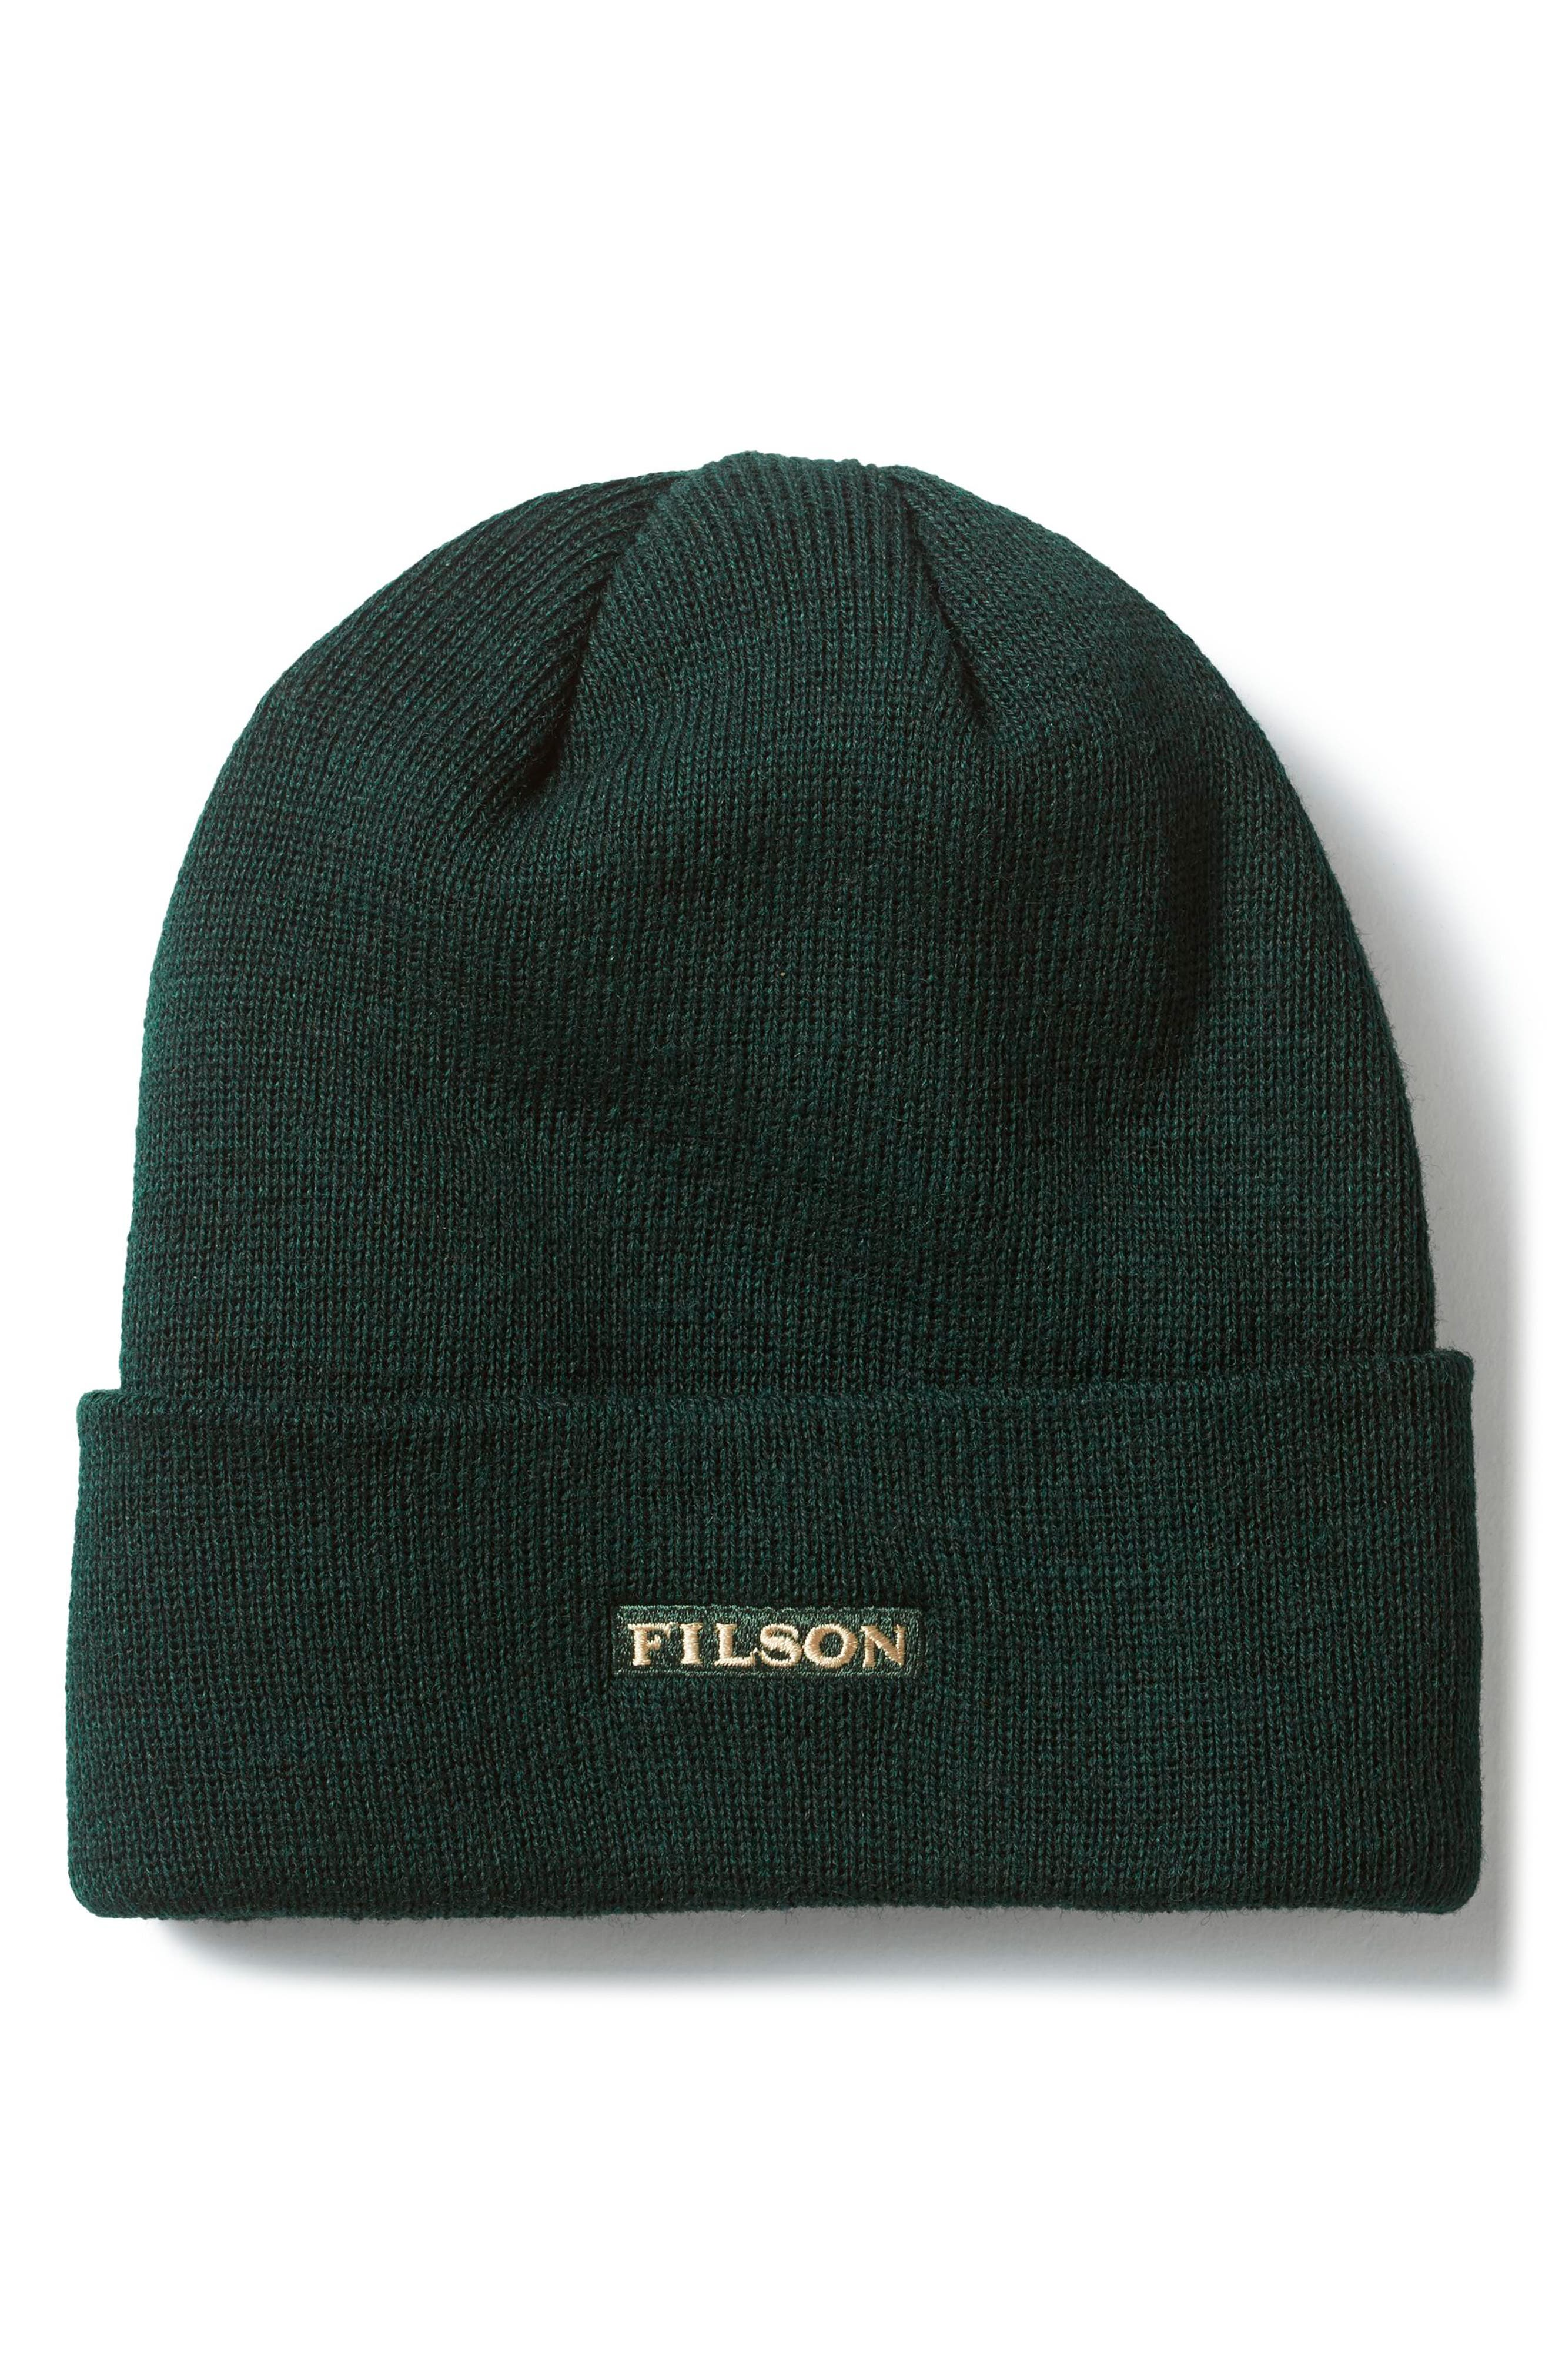 WOOL CAP - GREEN